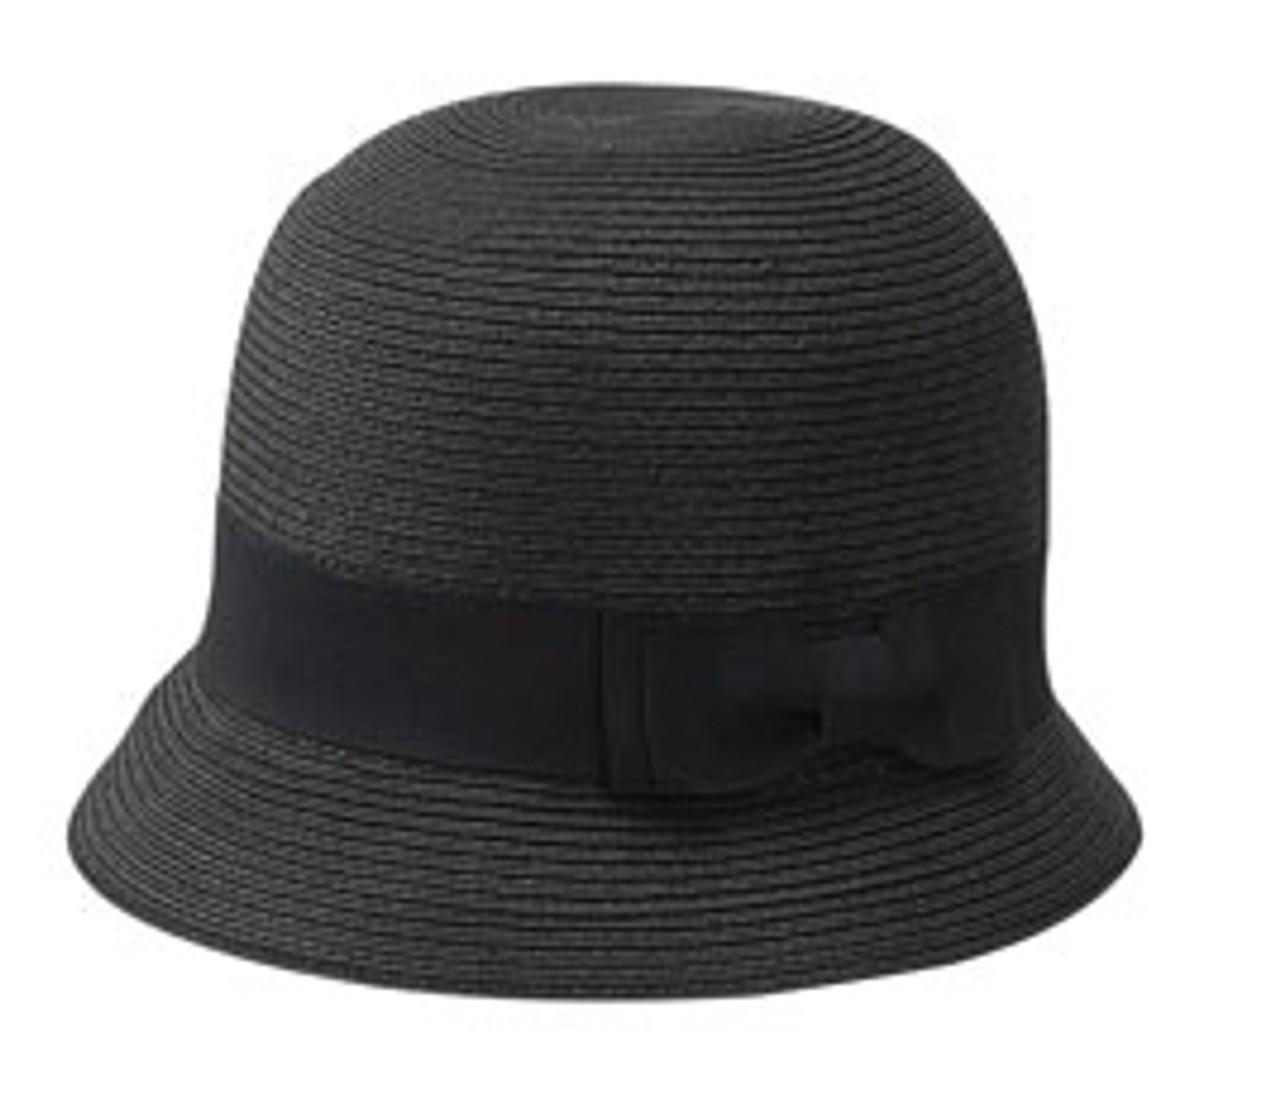 Cloche Hat Classic Wool Felt in Blue Gray tweed